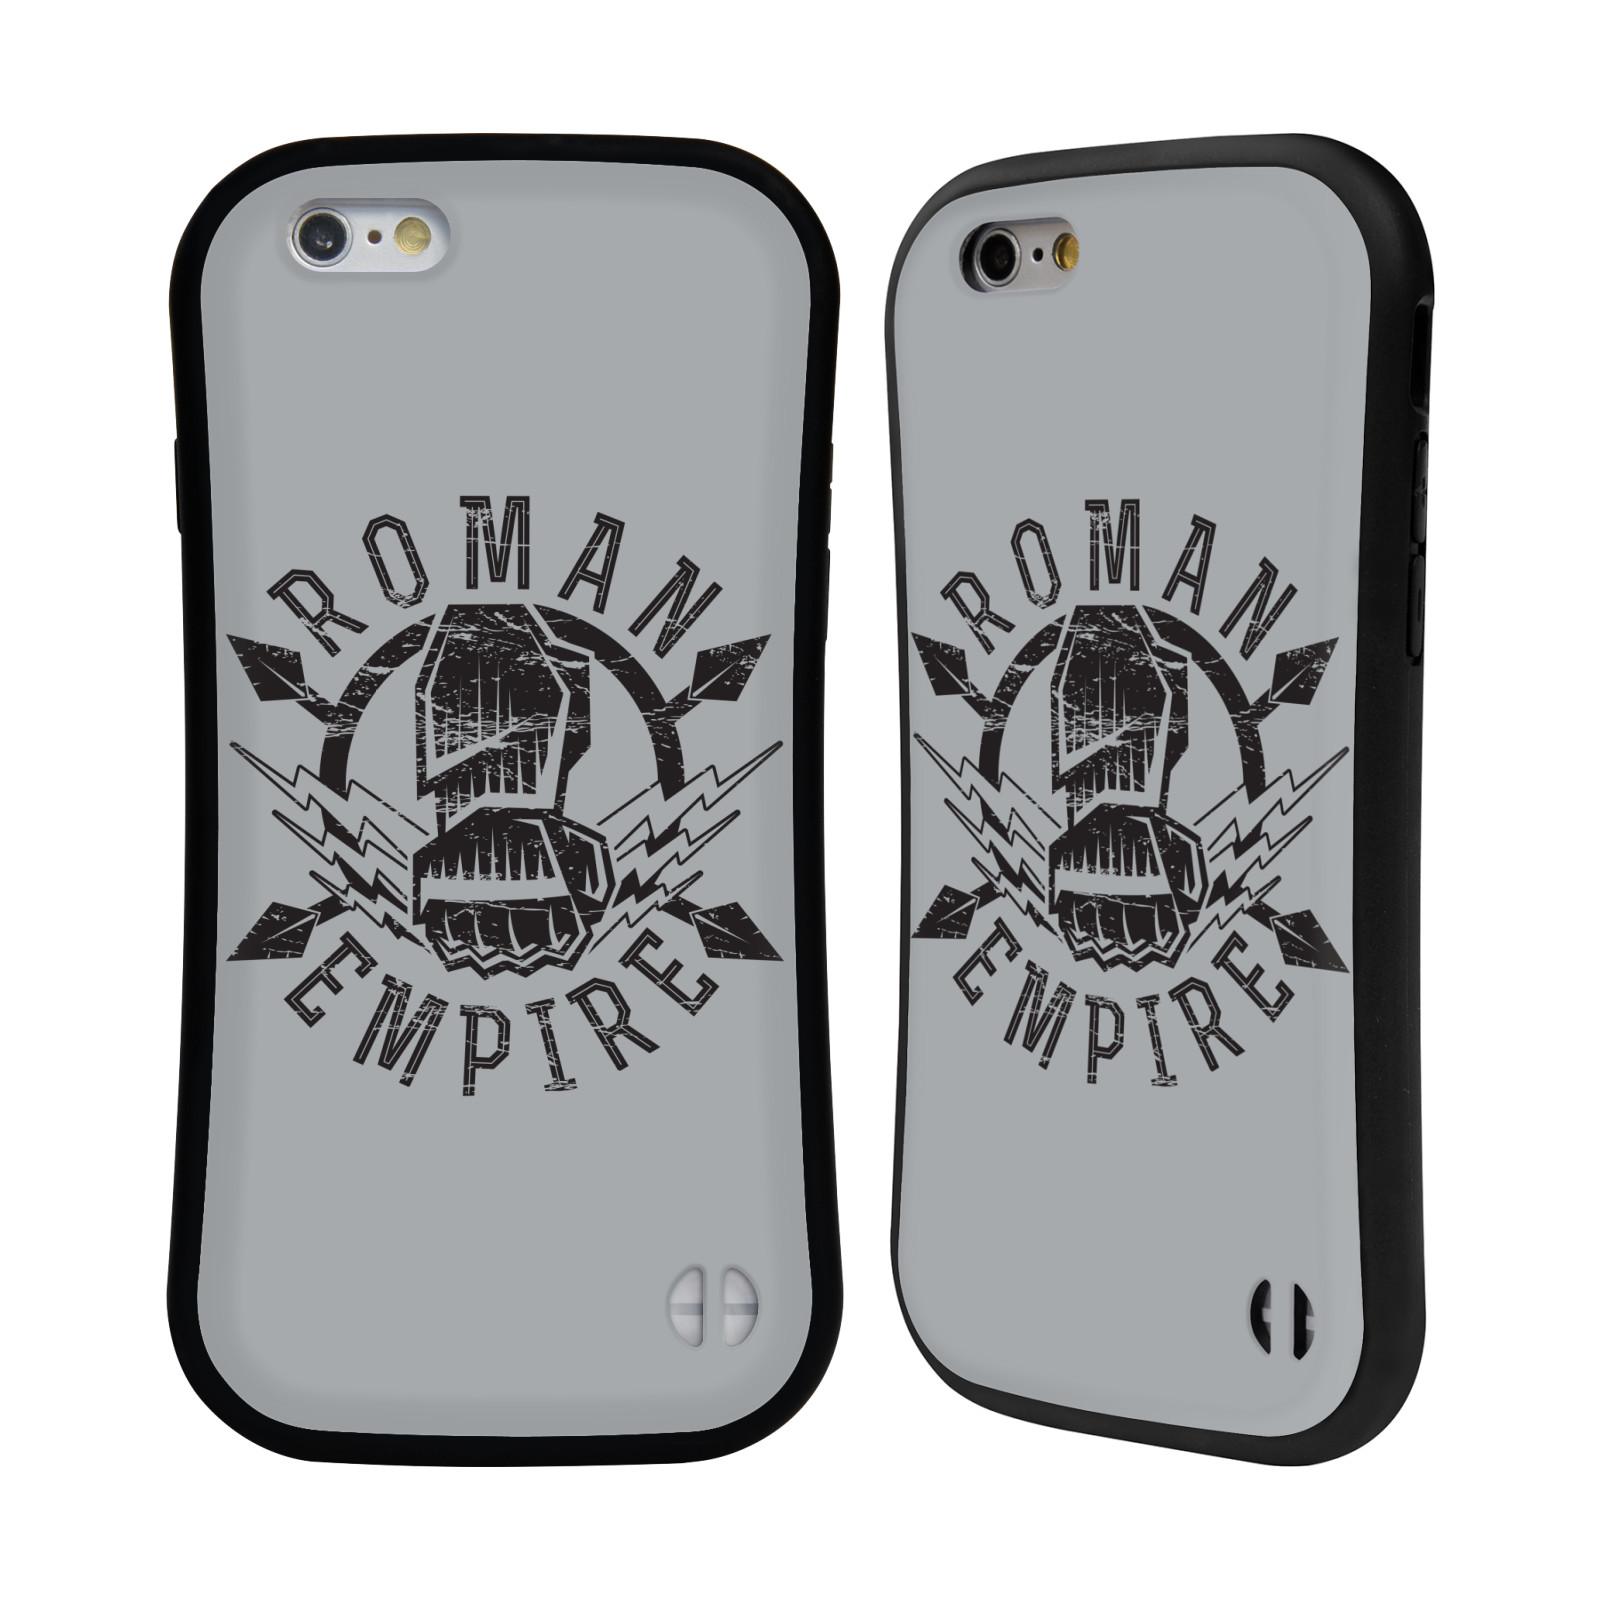 Emp Iphone Case